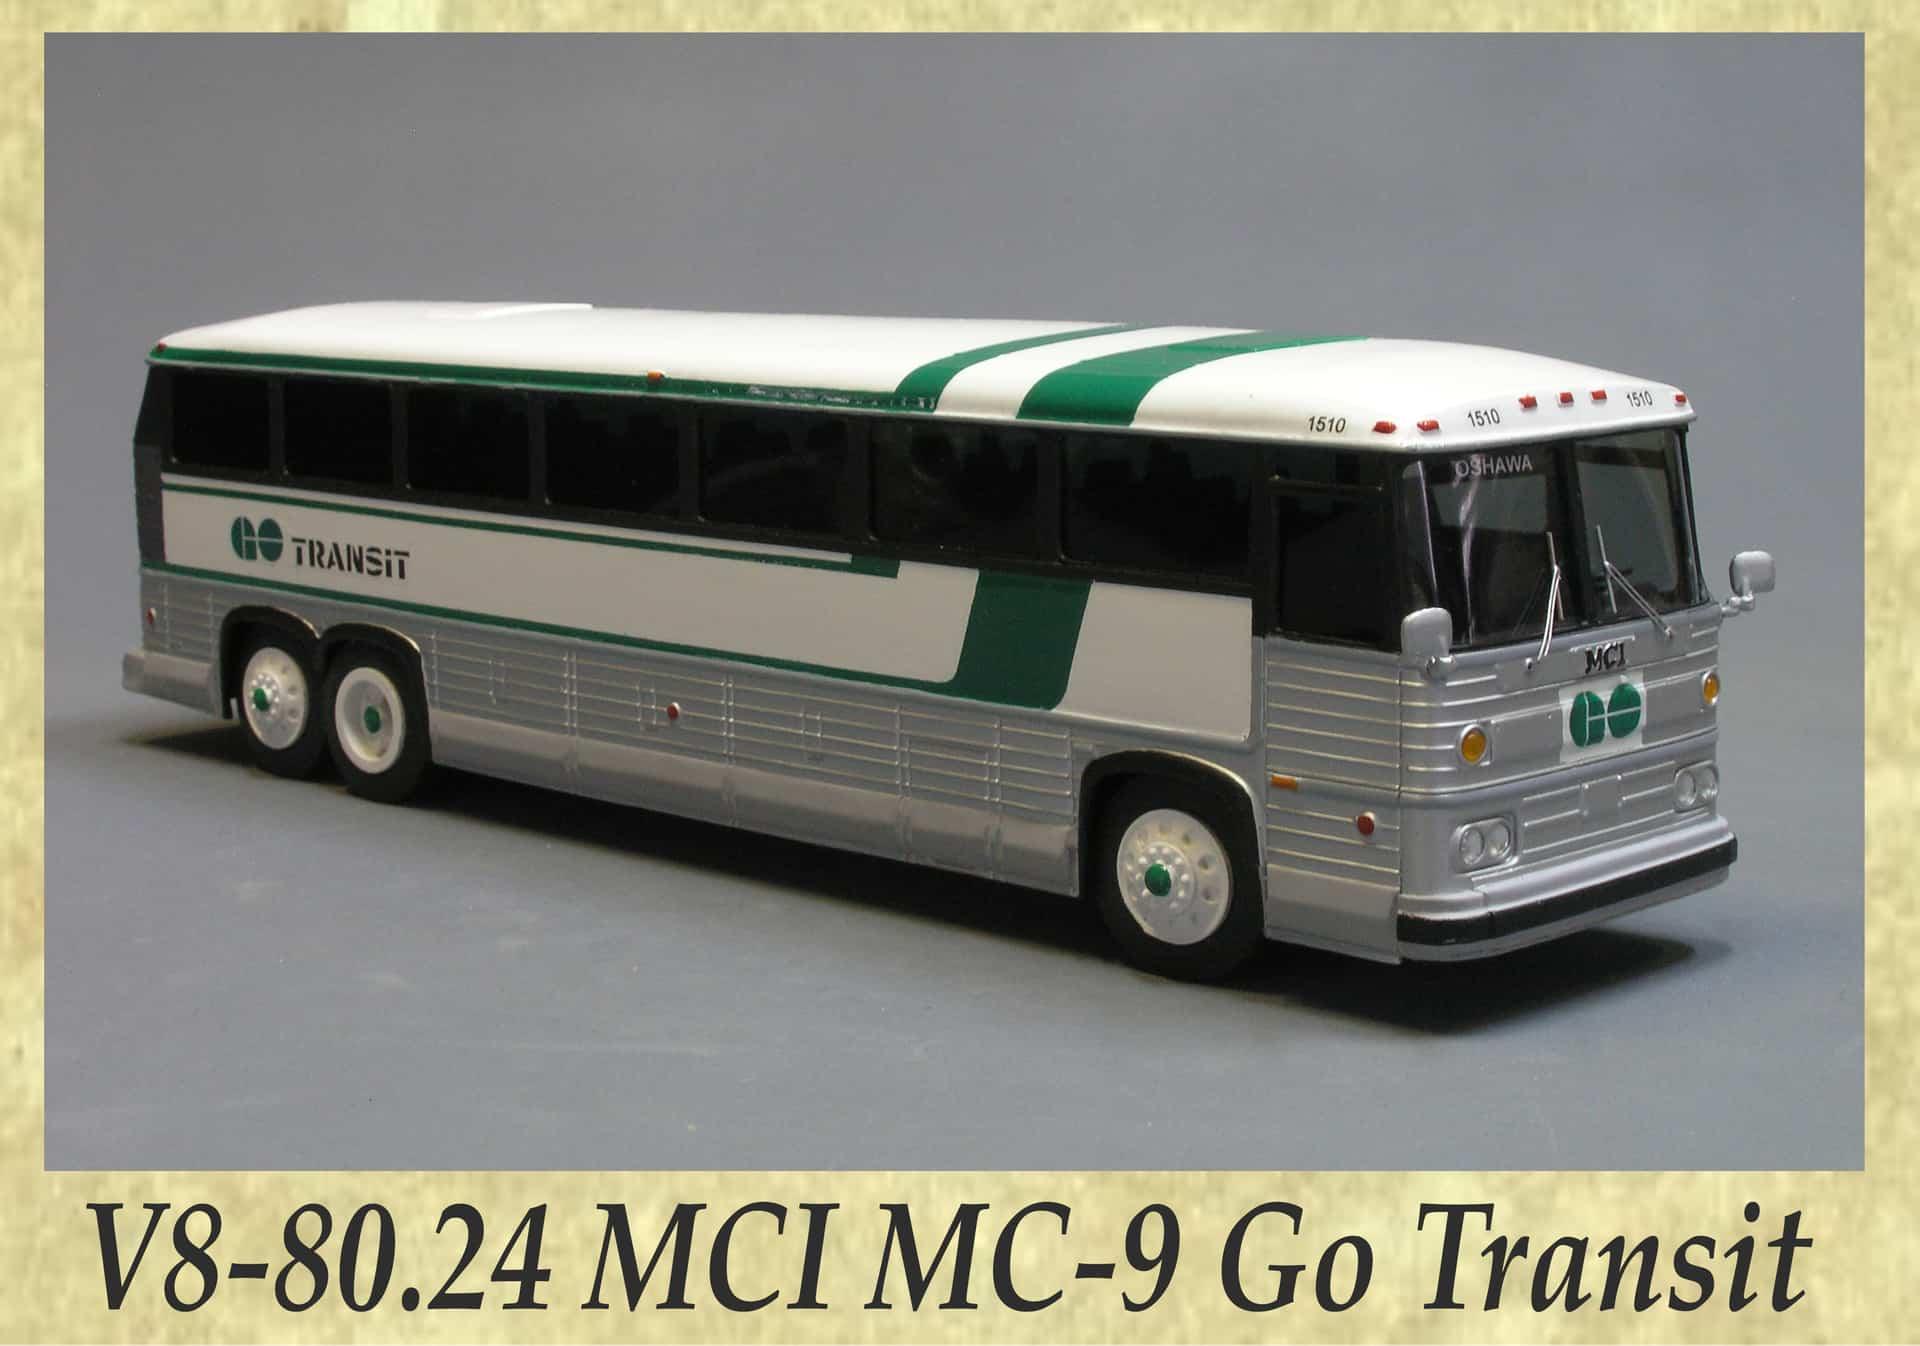 V8-80.24 MCI MC-9 Go Transit